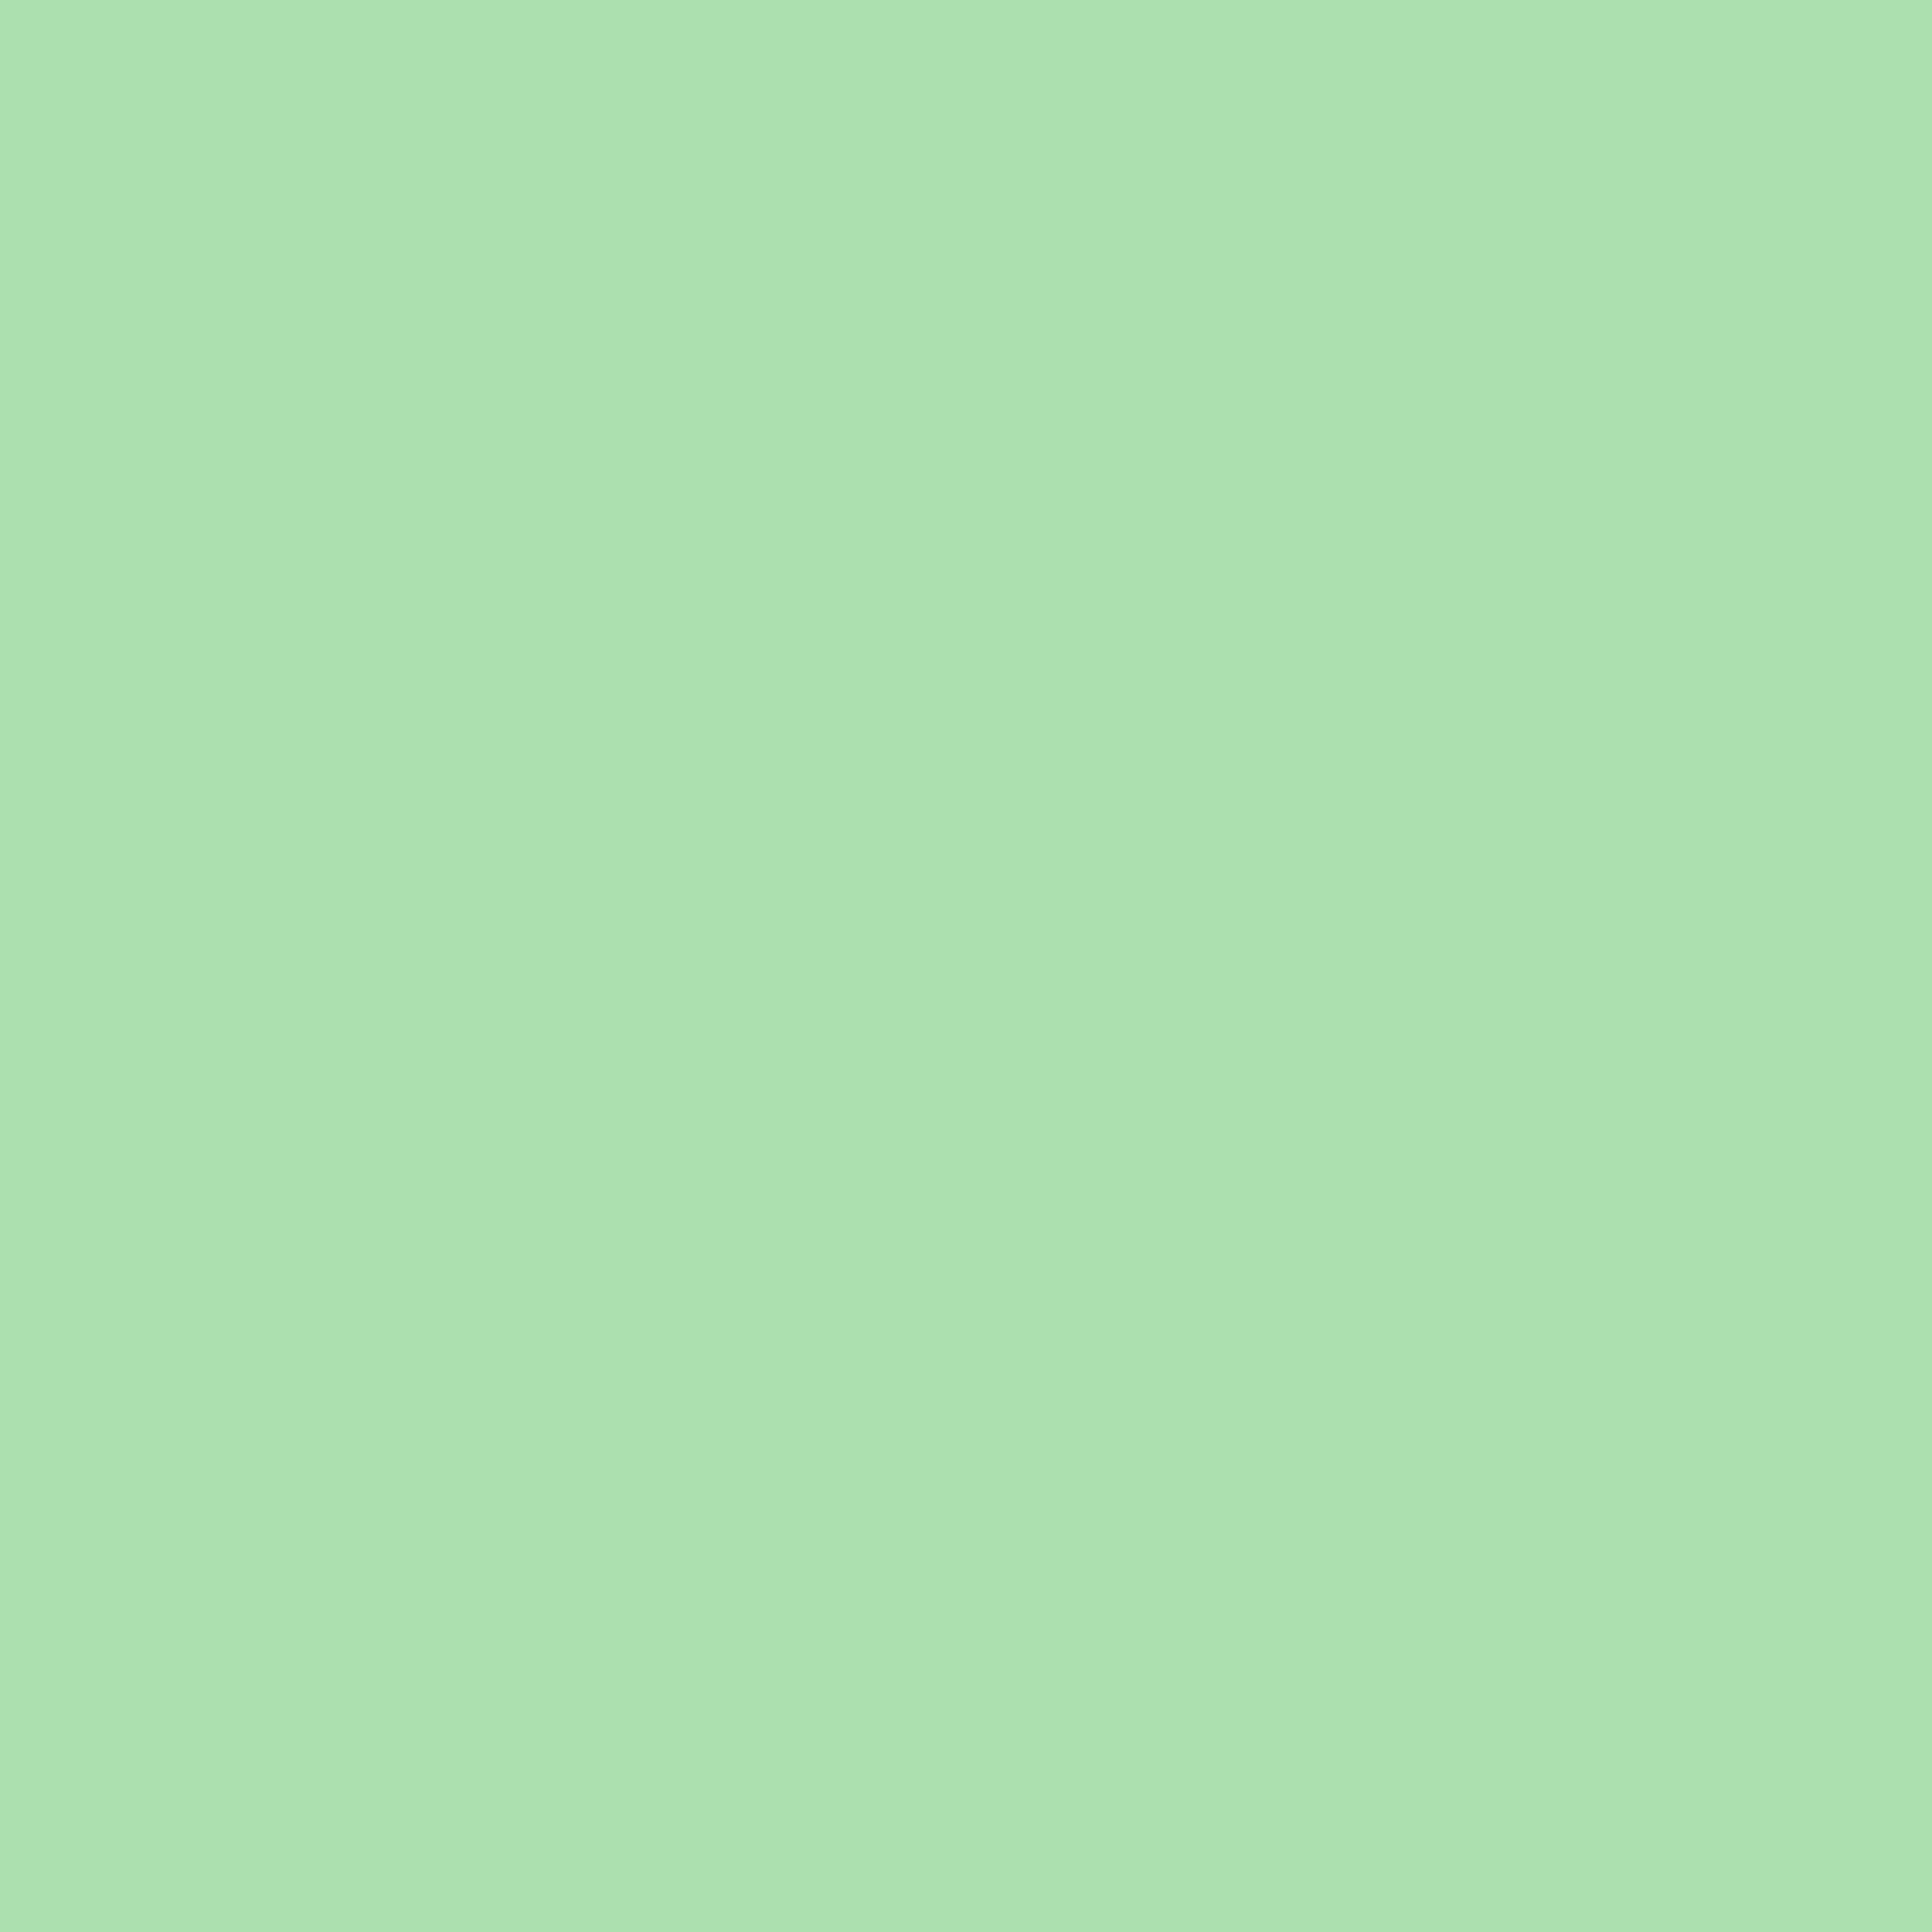 2048x2048 Celadon Solid Color Background